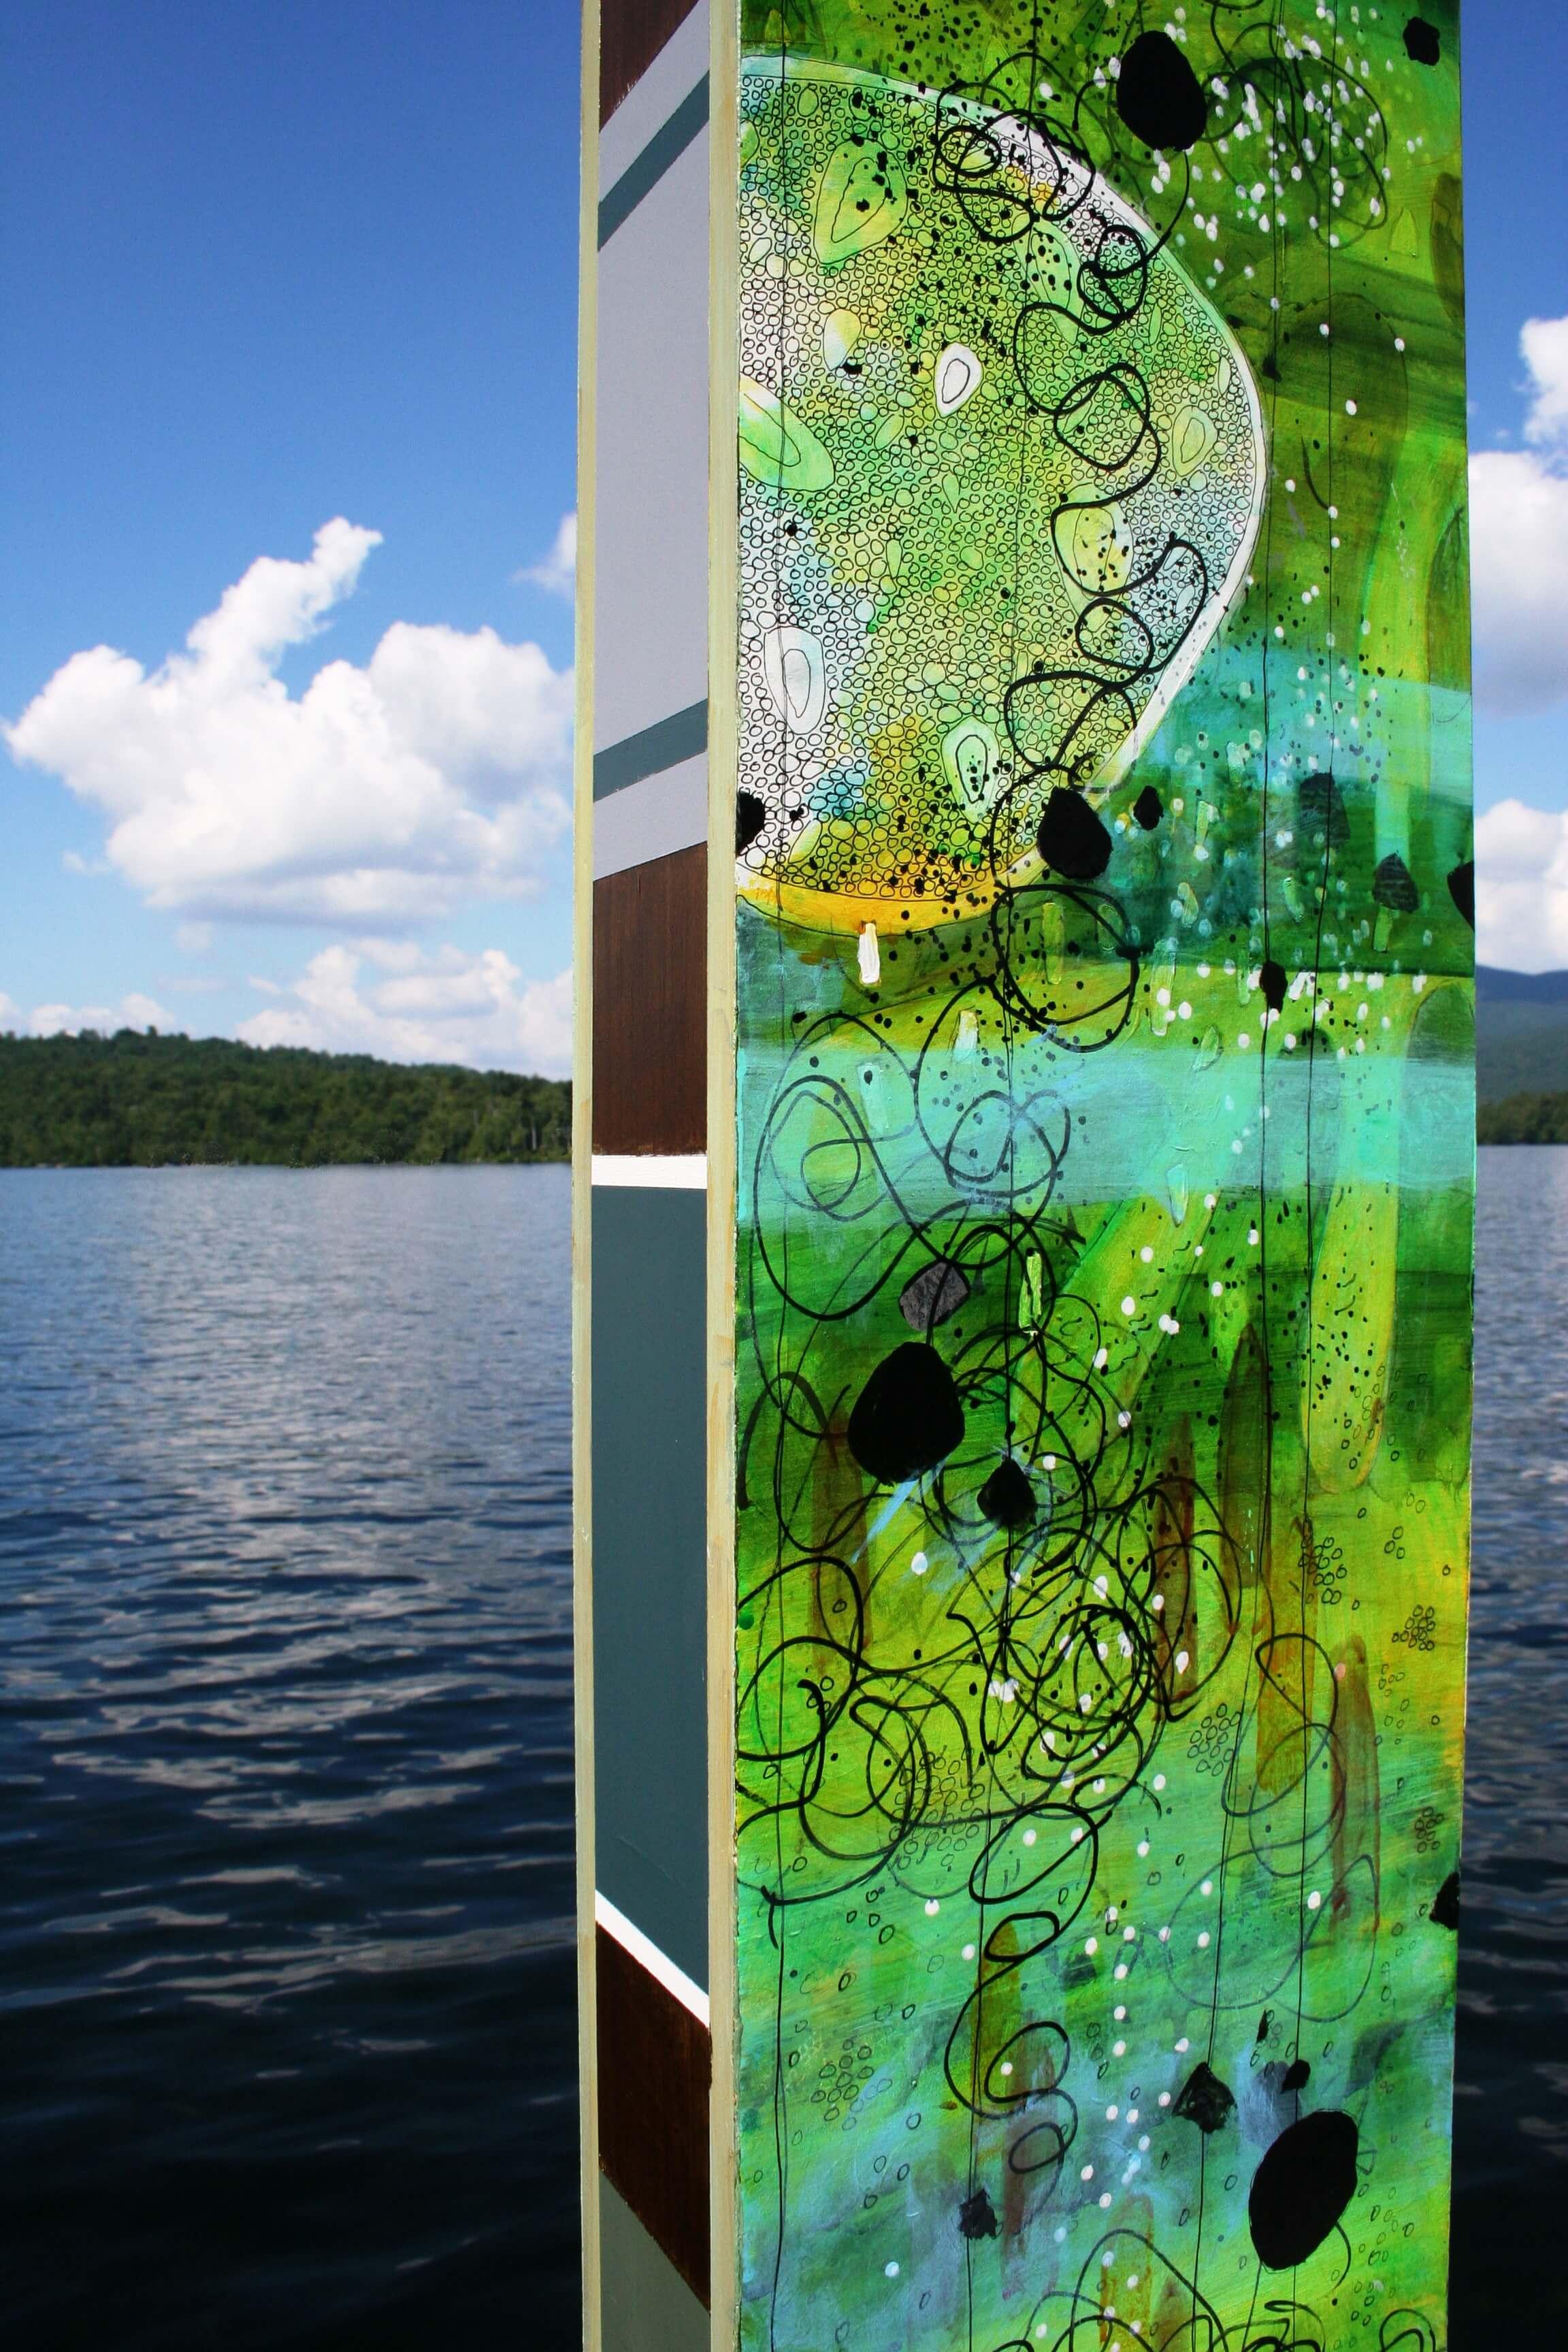 Aquatilis-11-by-the-lake